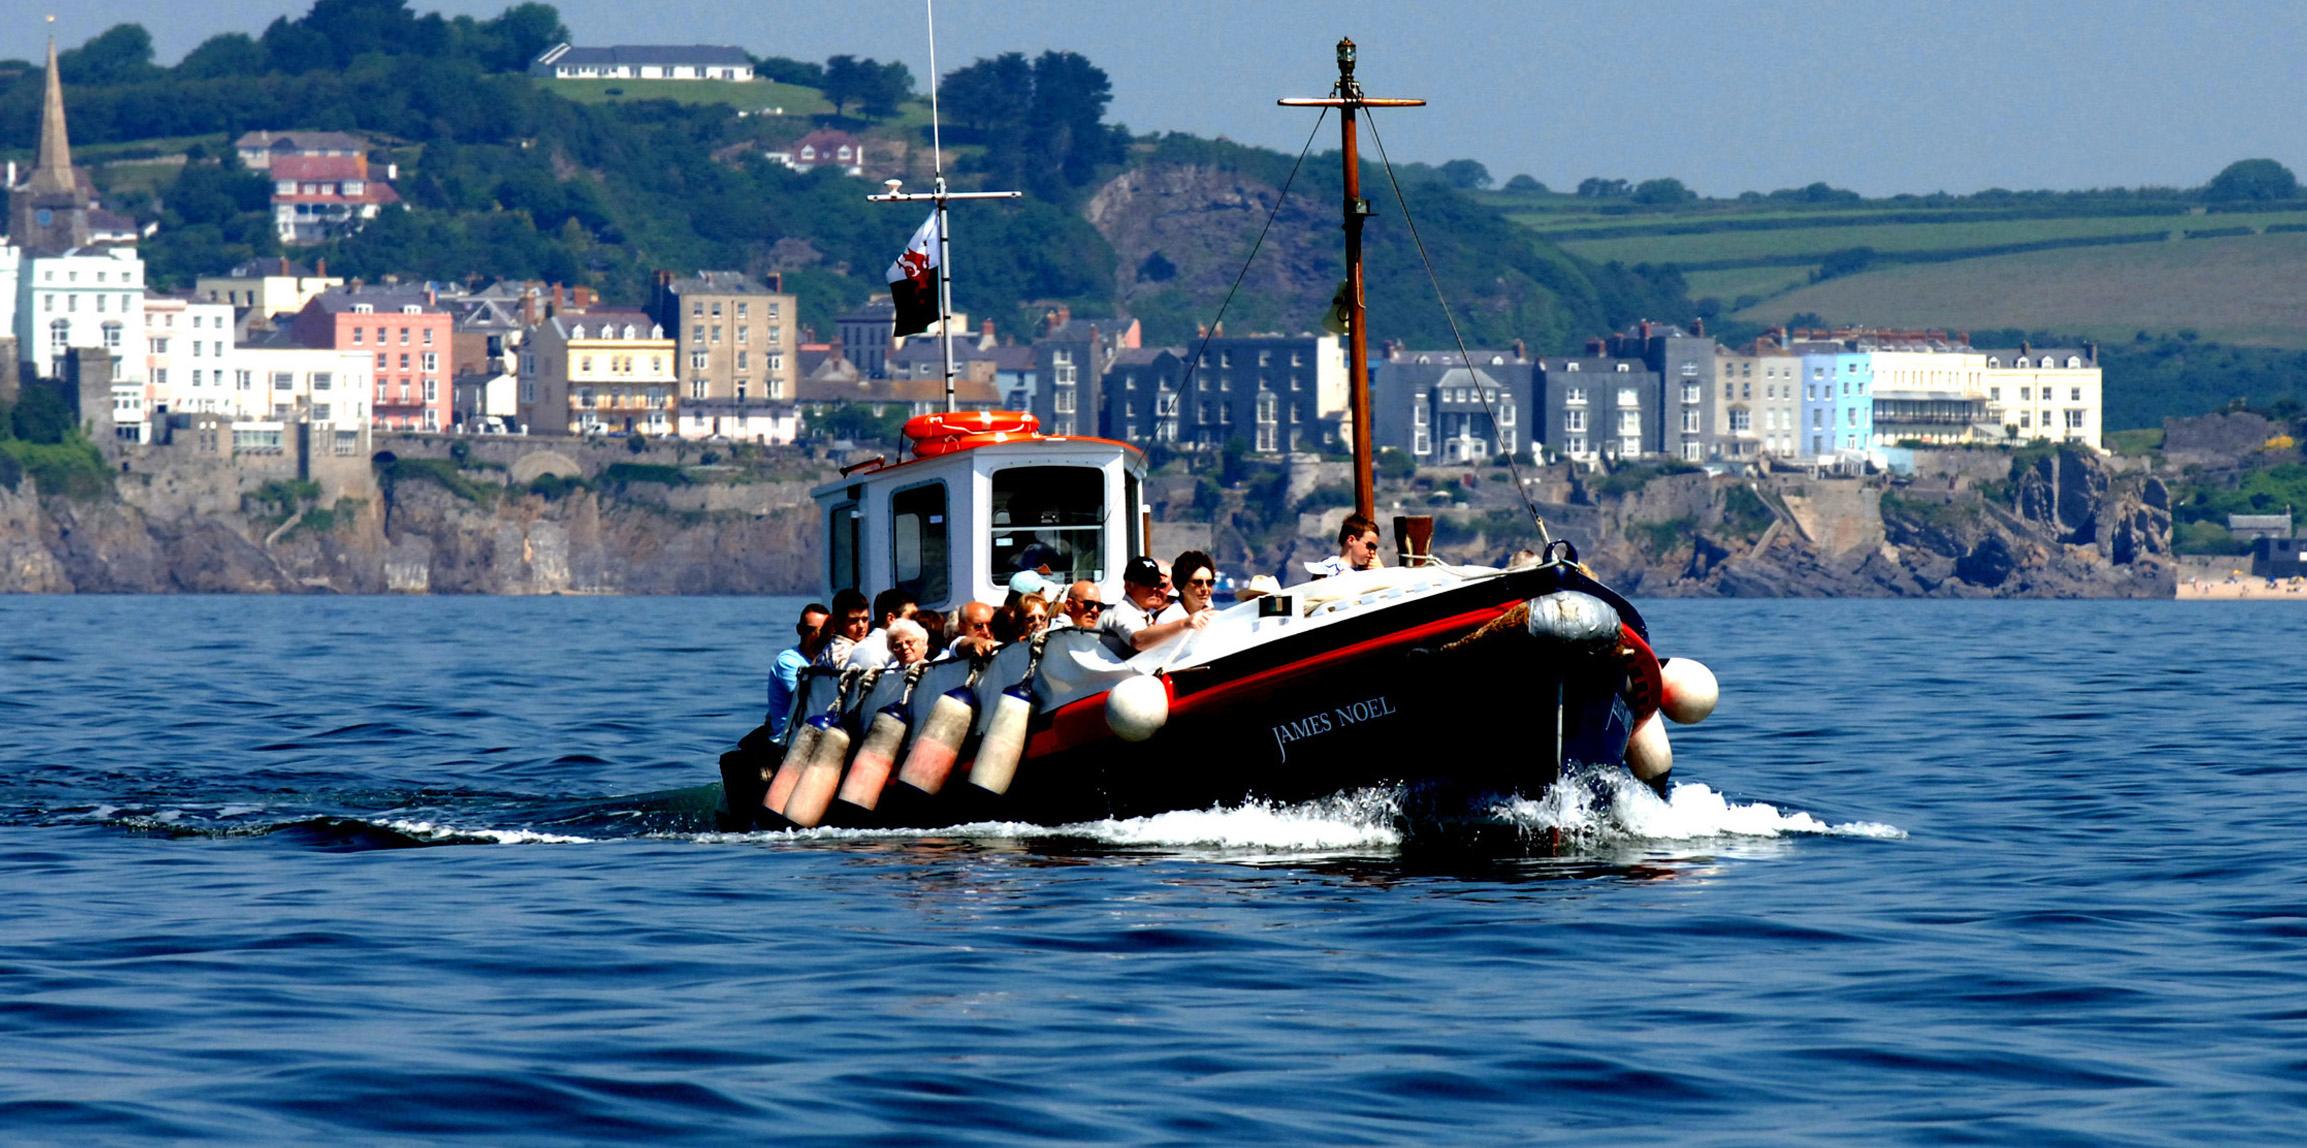 Caldey boat and Tenby copy.jpg